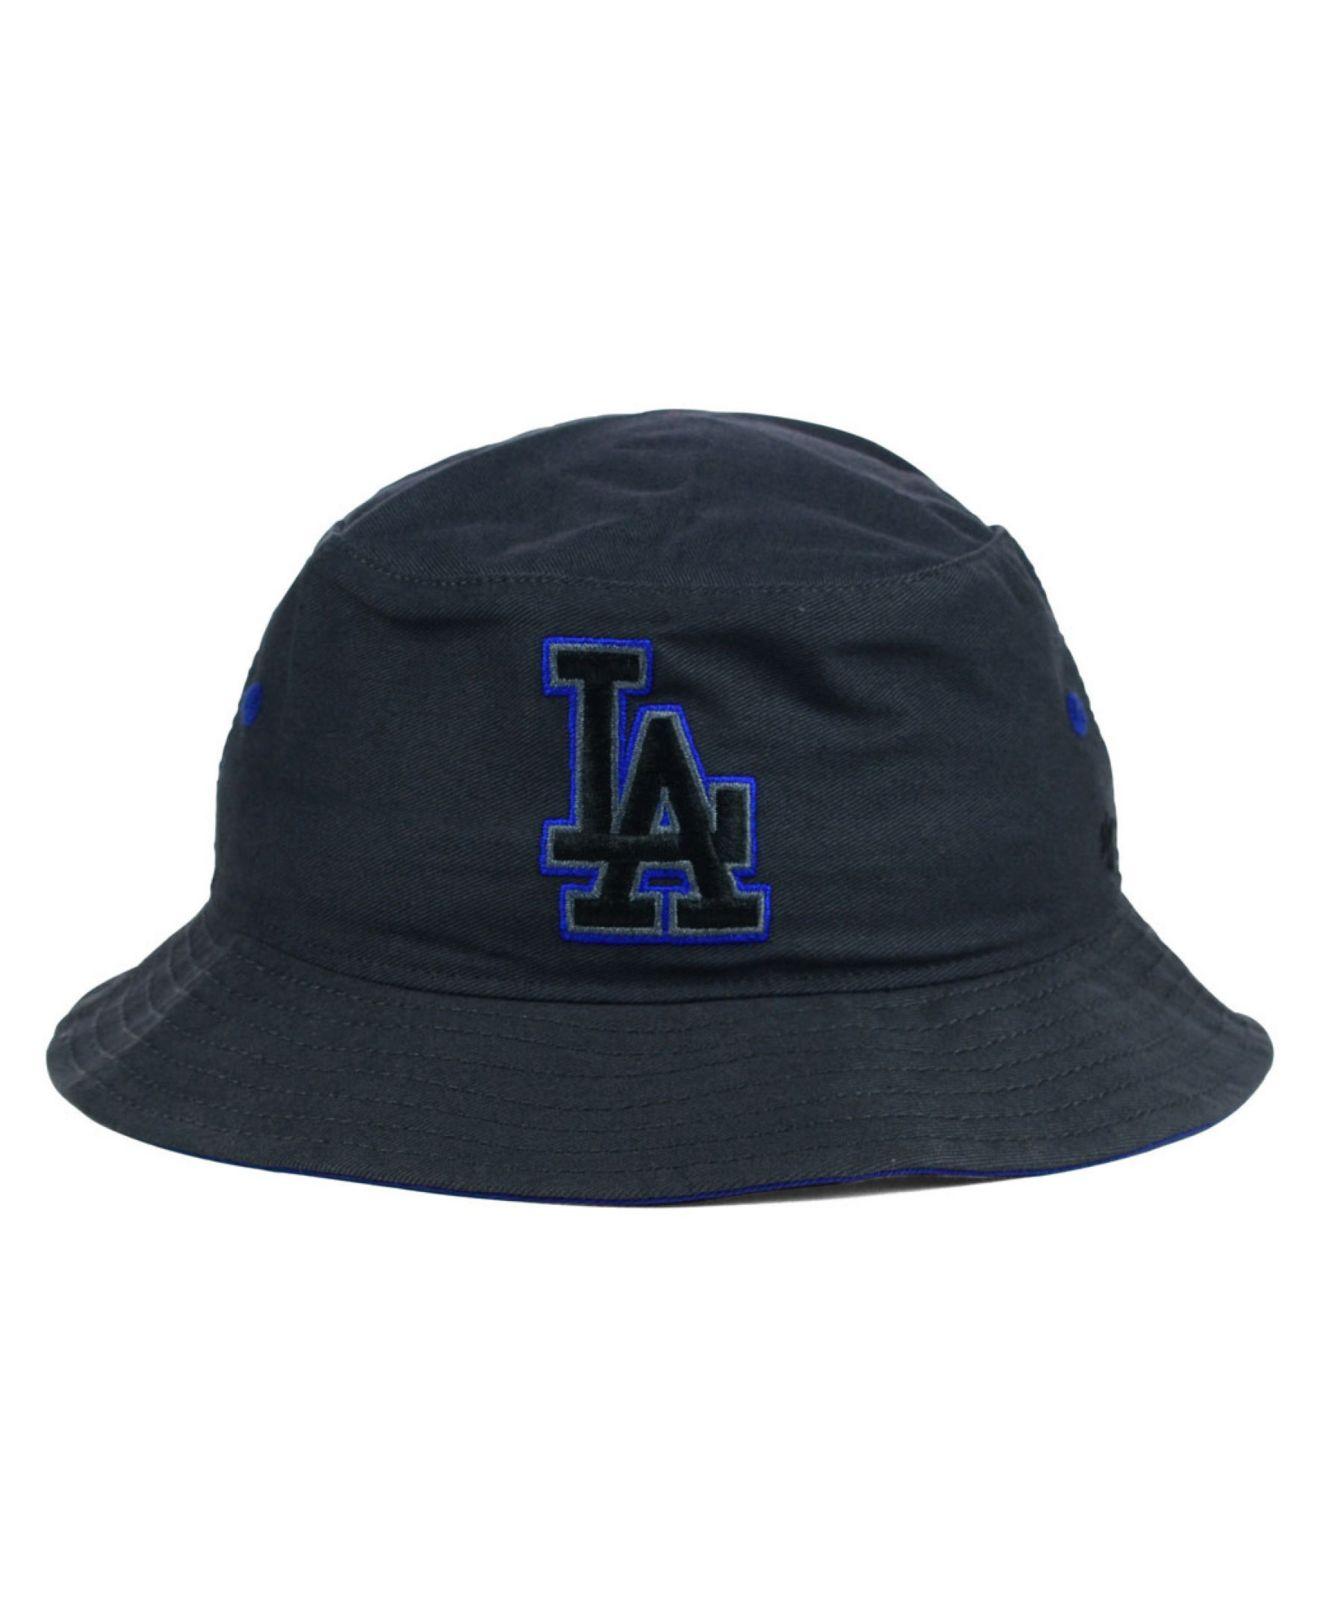 93d31957dc3 Lyst - 47 Brand Los Angeles Dodgers Turbo Bucket Hat in Gray